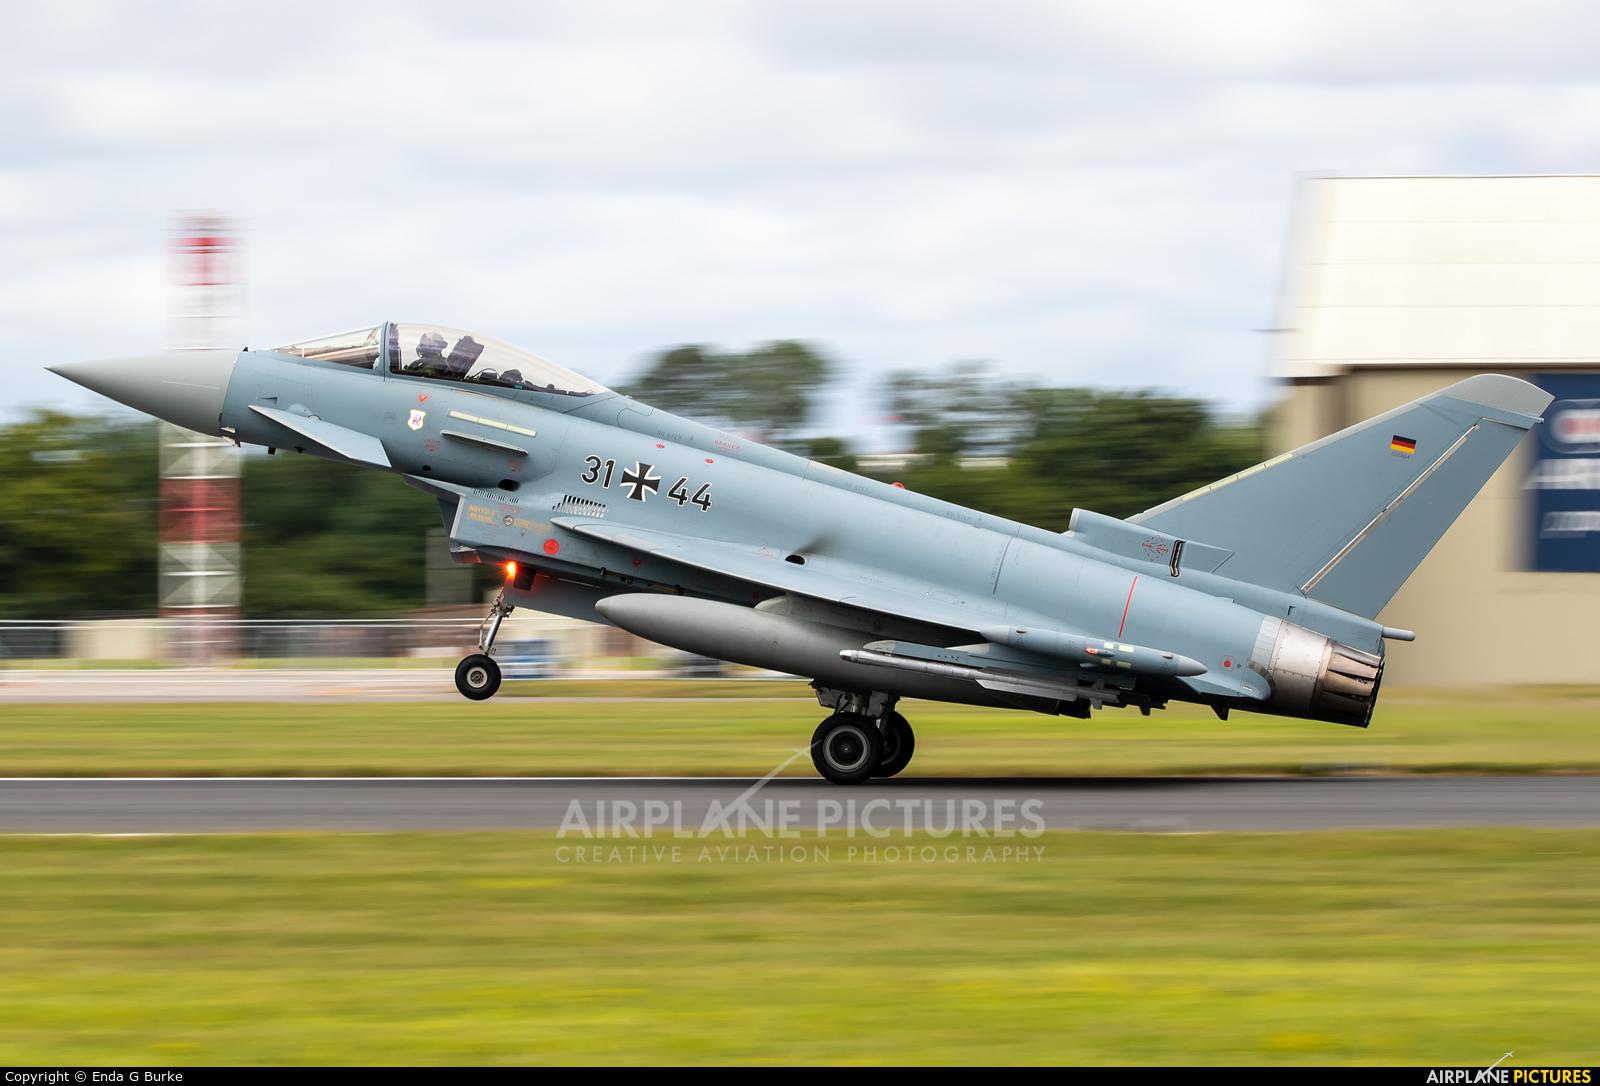 Germany - Air Force 31+44 aircraft at Fairford